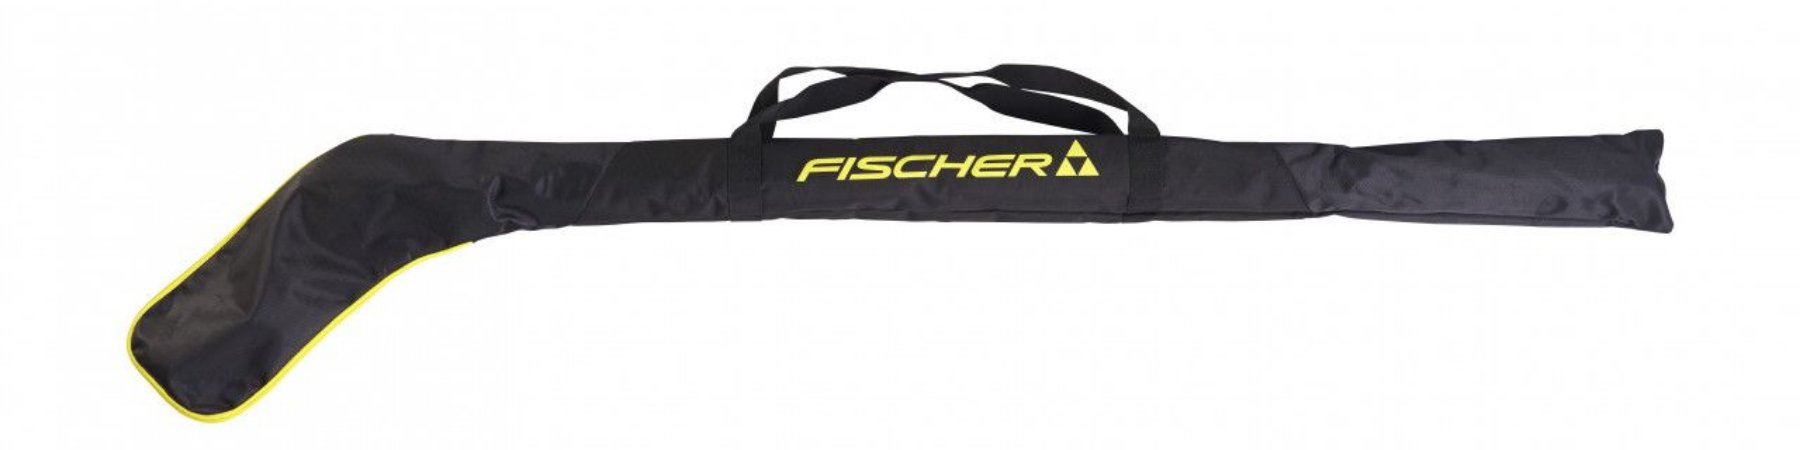 MALA PARA TACOS / STICK BAG FISCHER